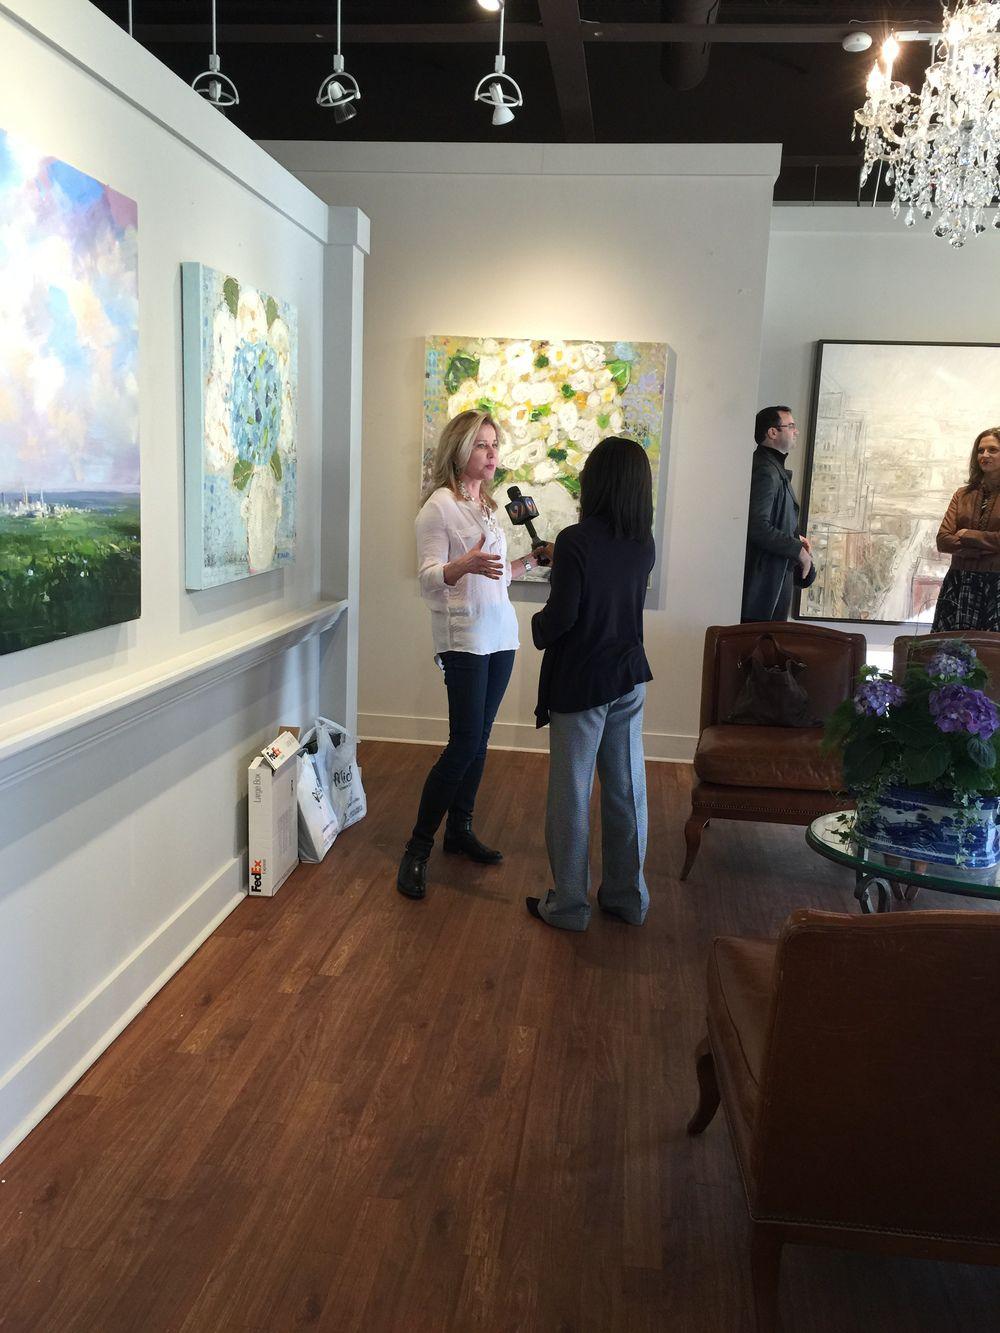 Shain Gallery